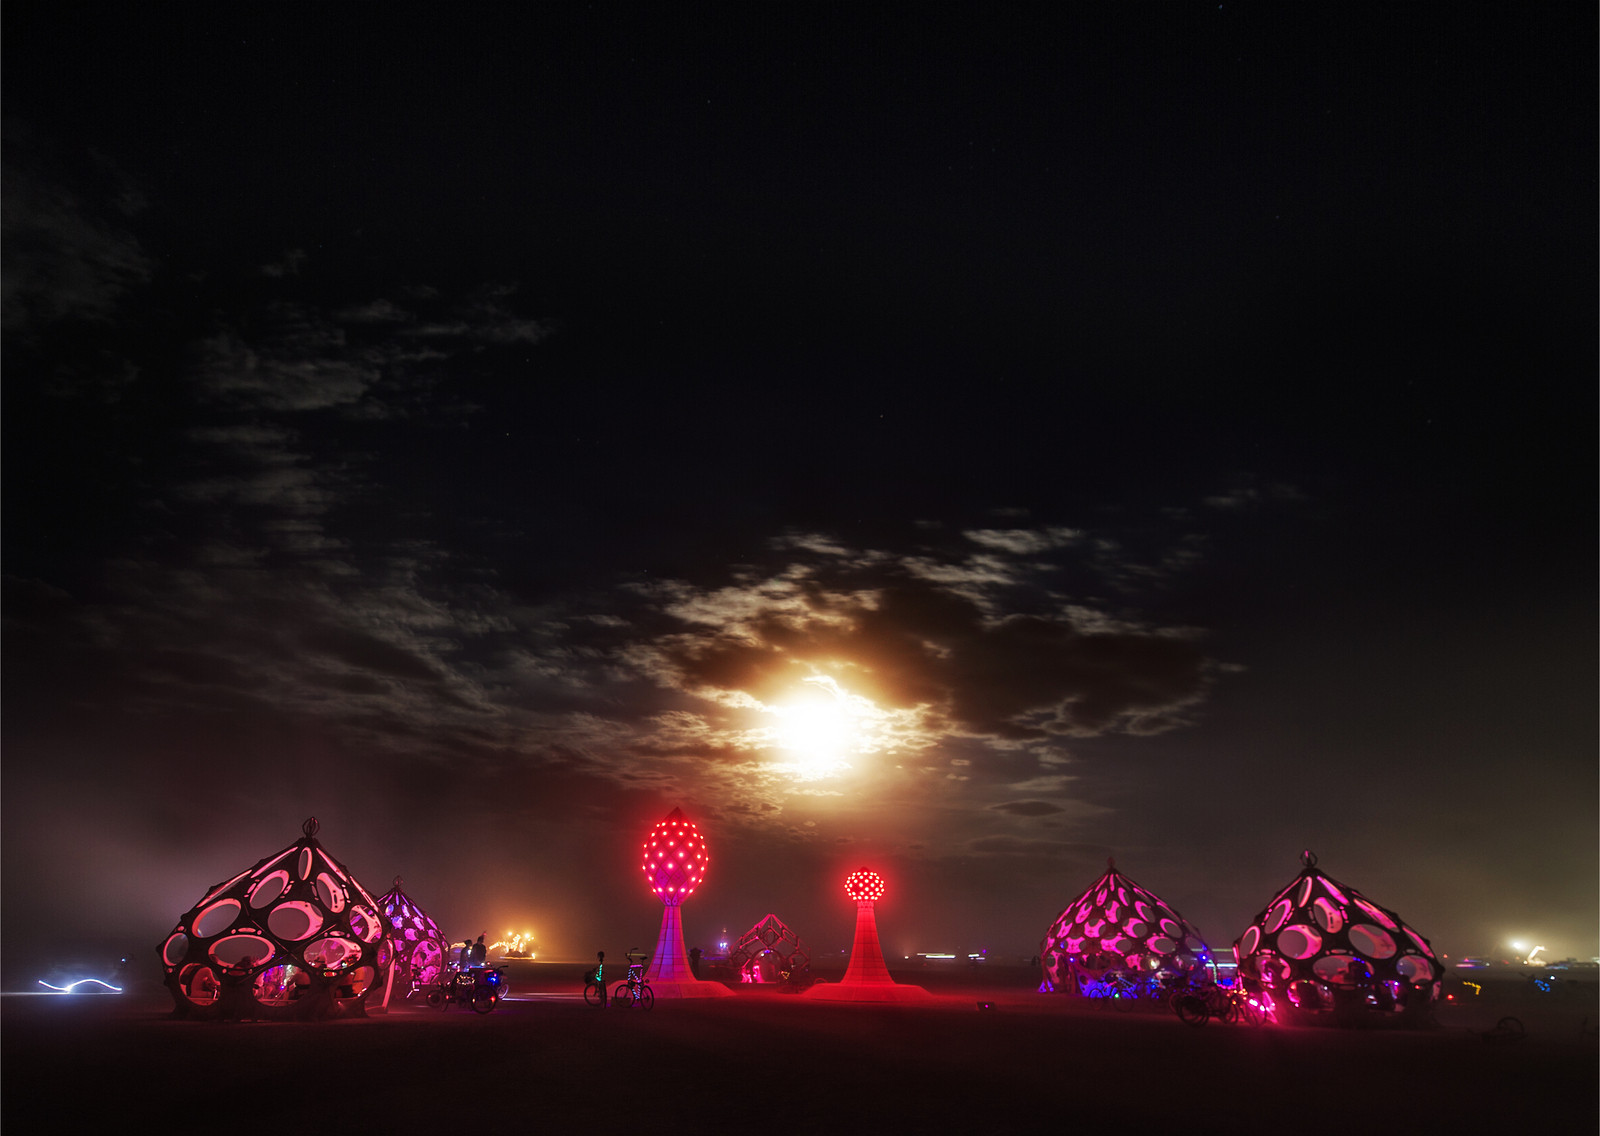 Trey Ratclif - Burning Man - Onion Domes-X3.jpg